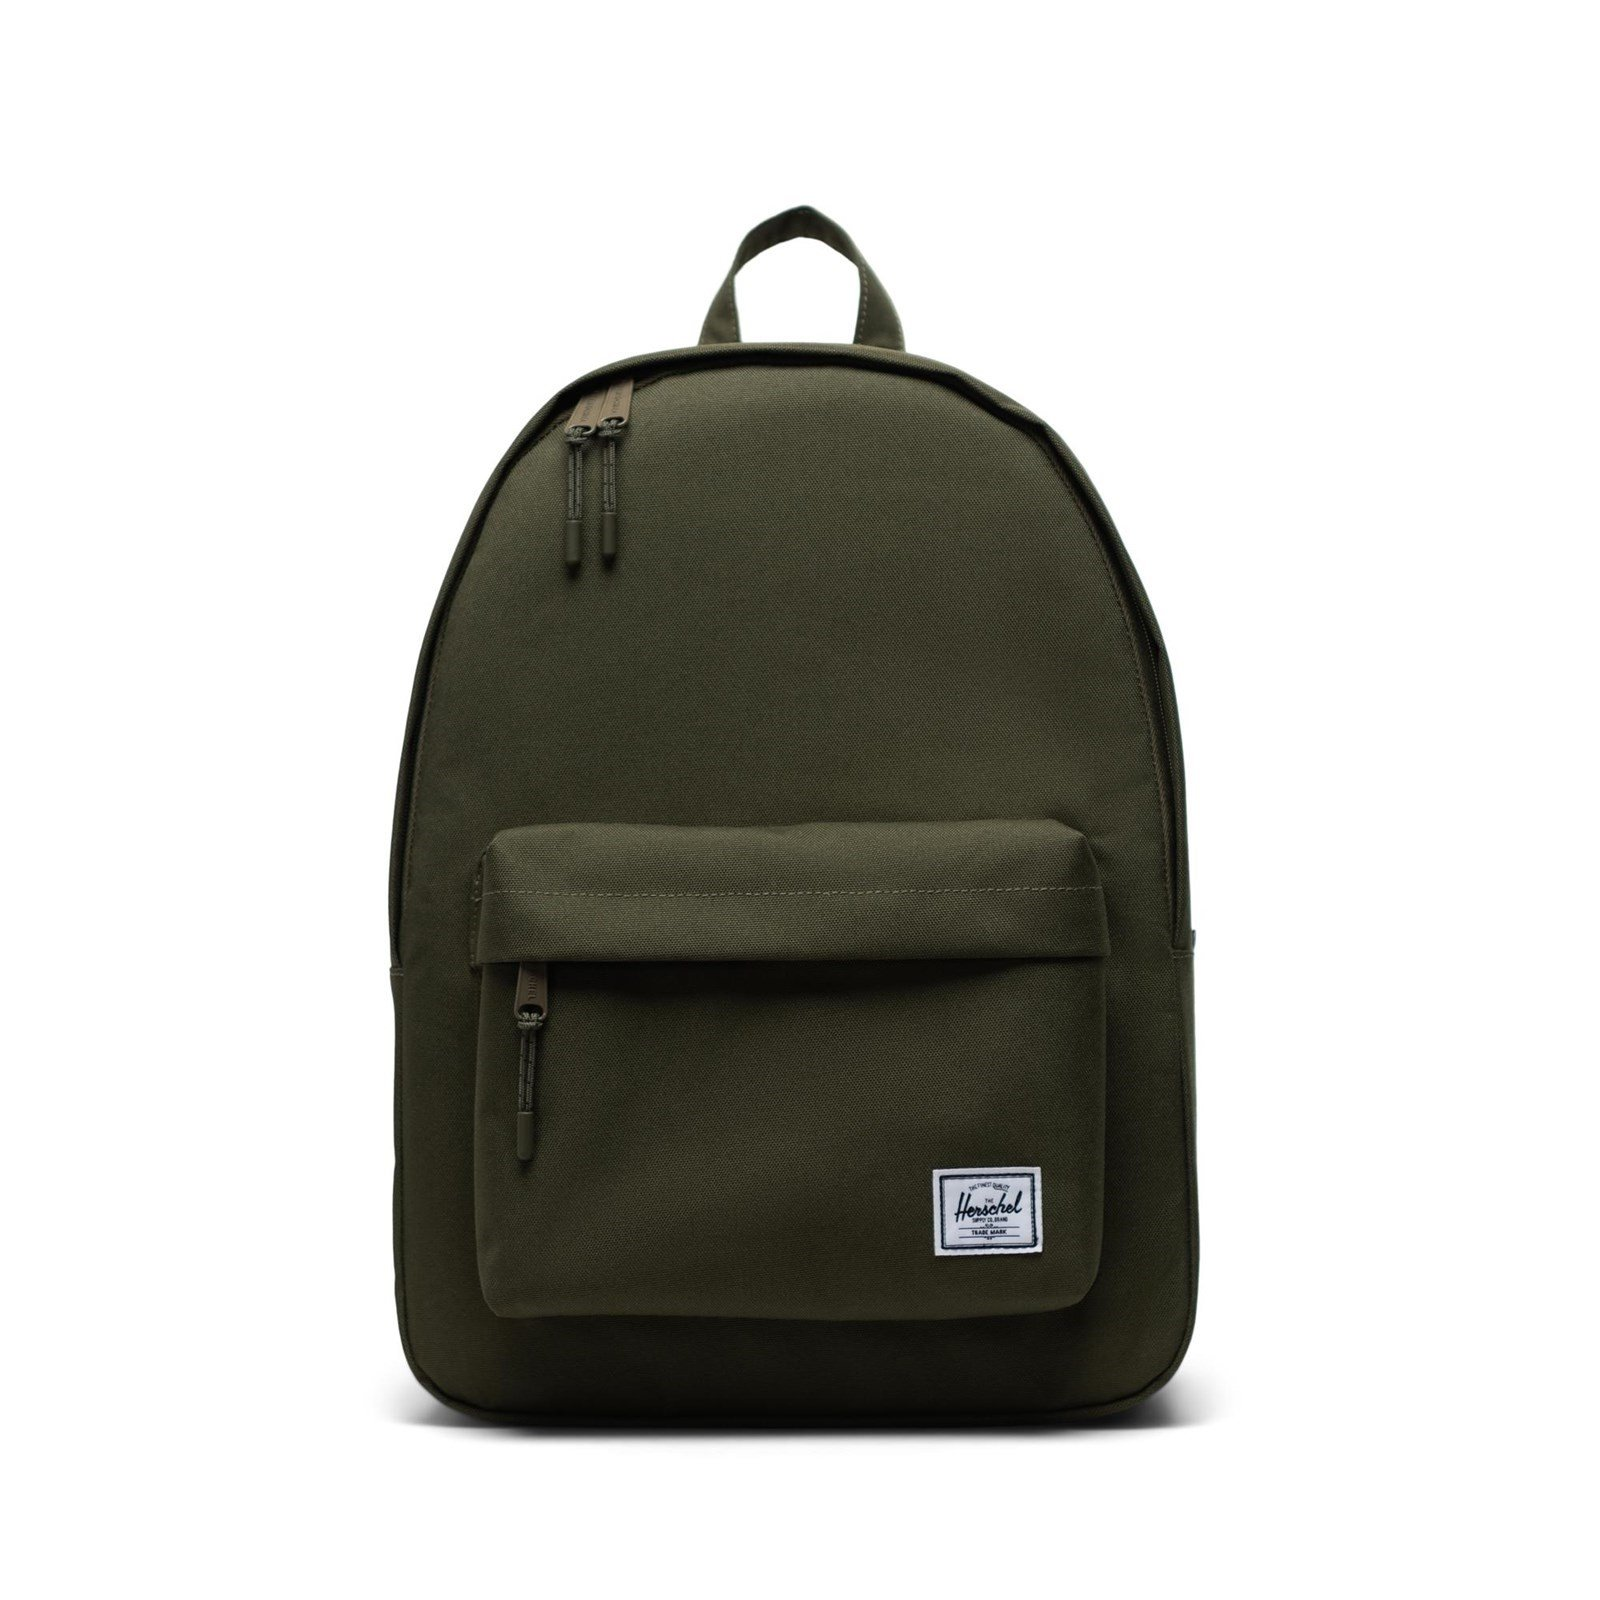 Herschel Women's Classic Backpack Various Colours 33599 - Ivy Green Itm